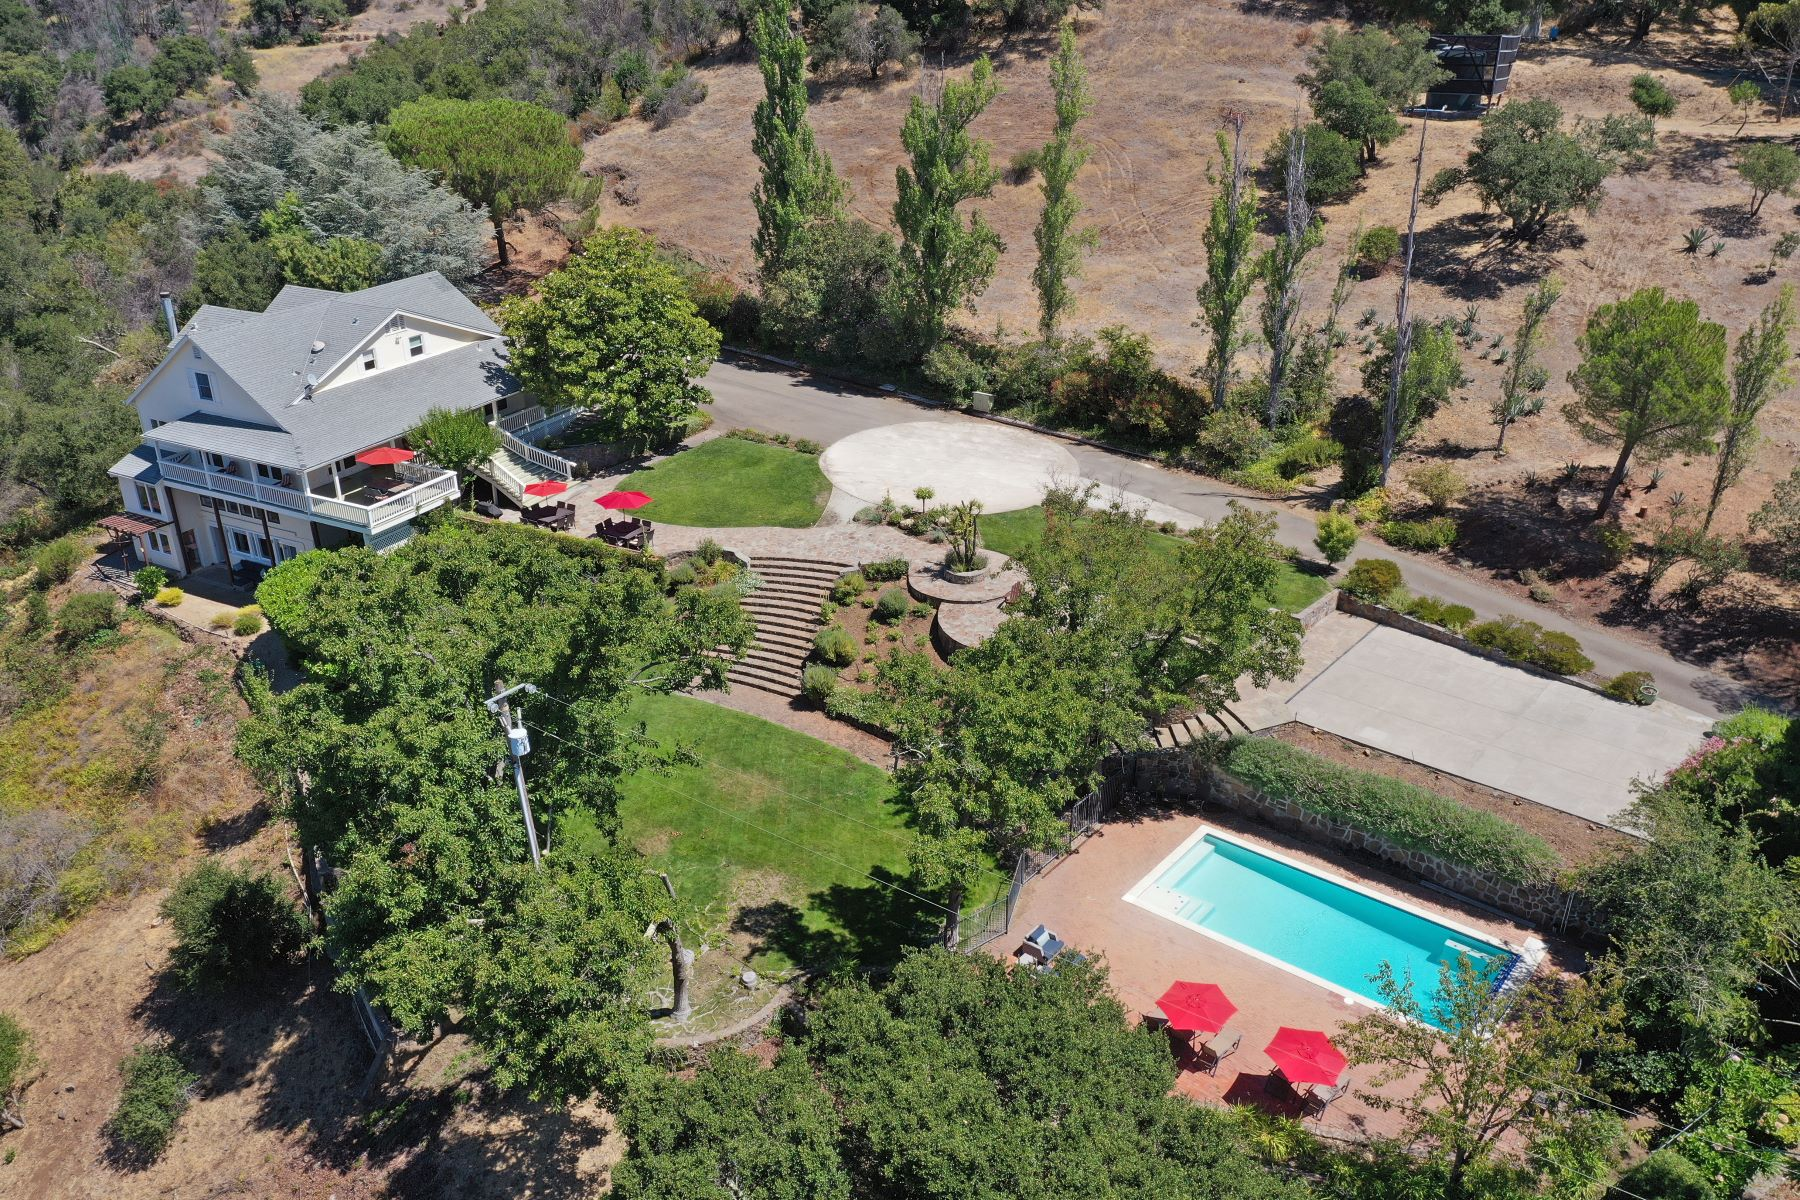 Other Residential Homes 为 销售 在 Majestic Moon Mountain 1750 Moon Mountain Rd 索诺玛, 加利福尼亚州 95476 美国